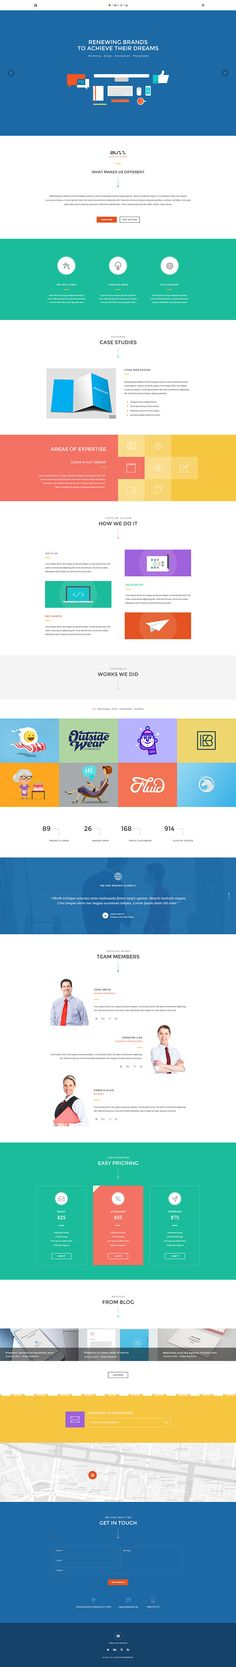 Buzz - Flat OnePage Web Template on Behance